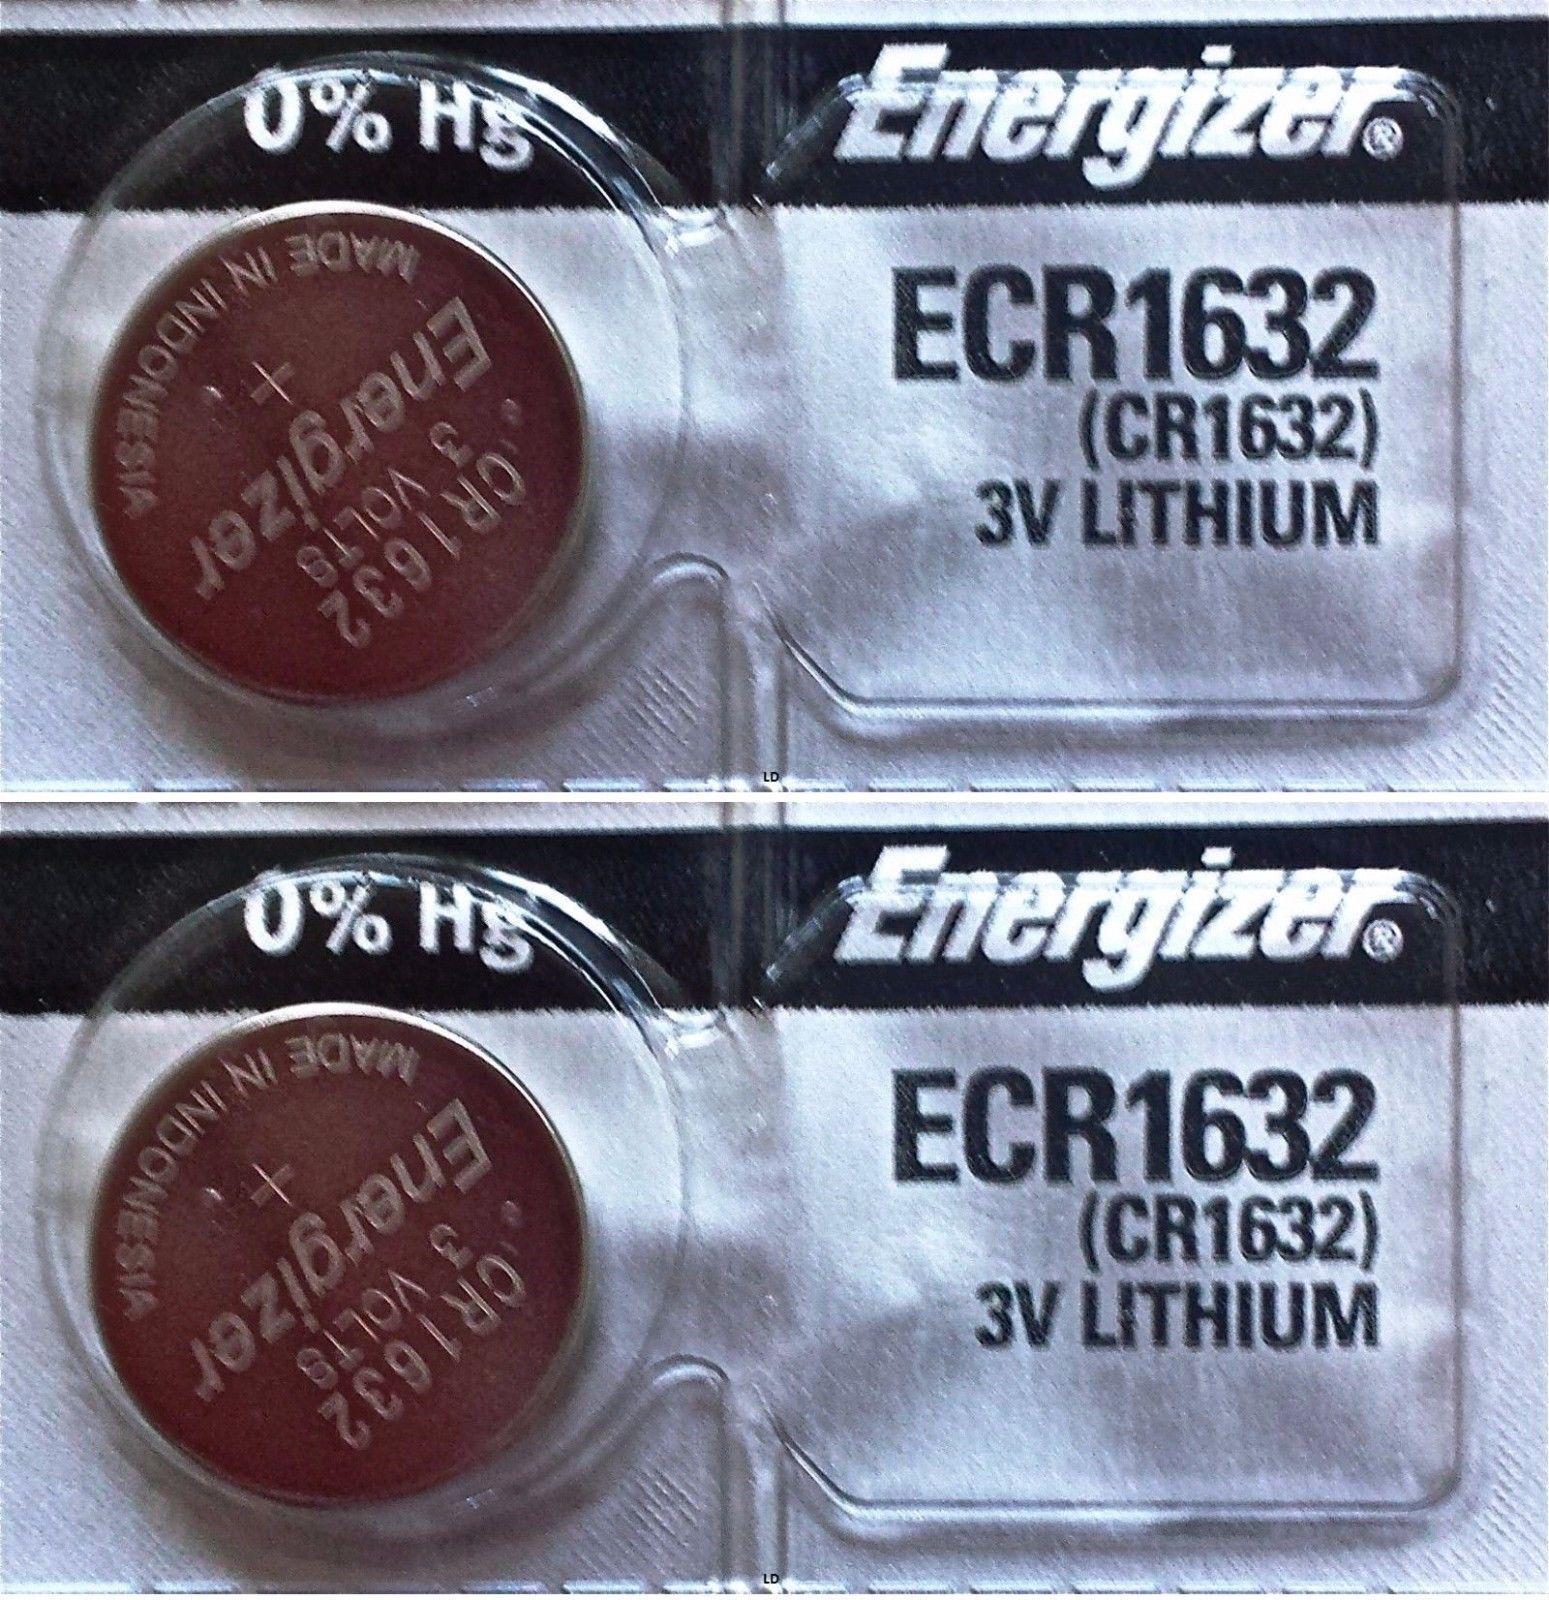 2 Piece FRESH ENERGIZER CR1632 ECR1632 1632 3V Lithium Coin Battery Expire 2025 Consumer Electronics